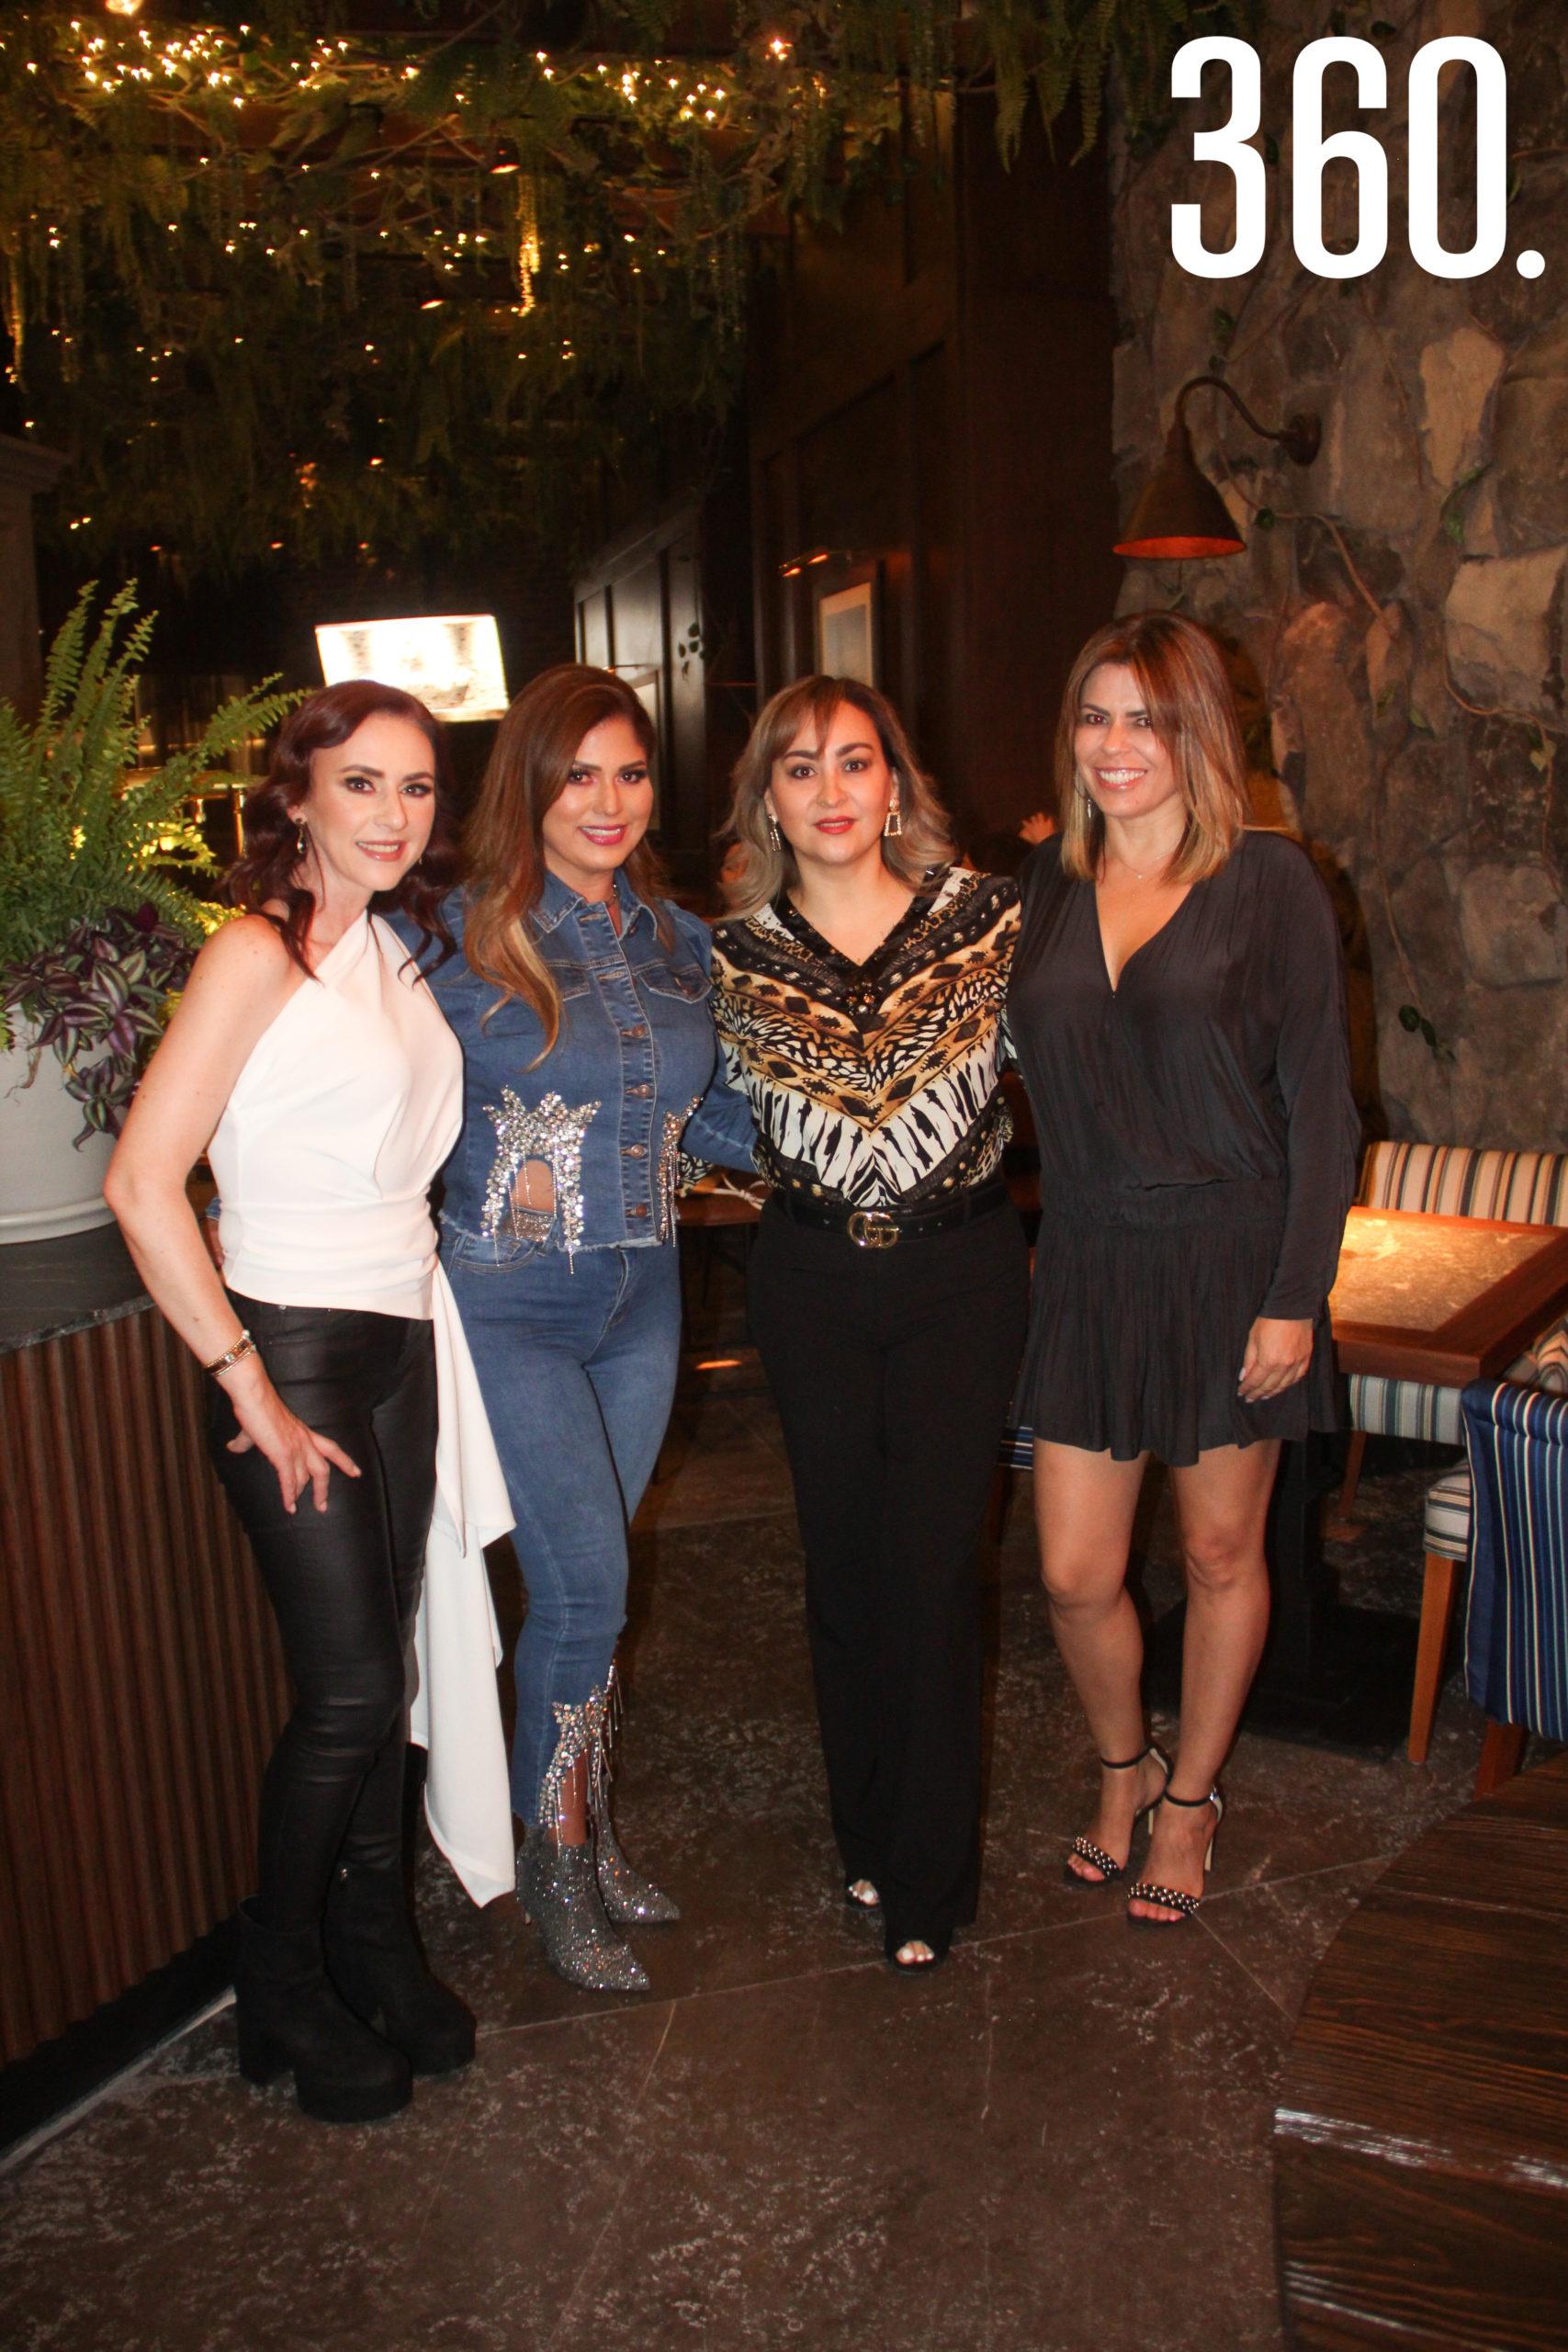 Bárbara Salinas, Yadira de Bonetti, Silvia de González y Miriam Alfaro.